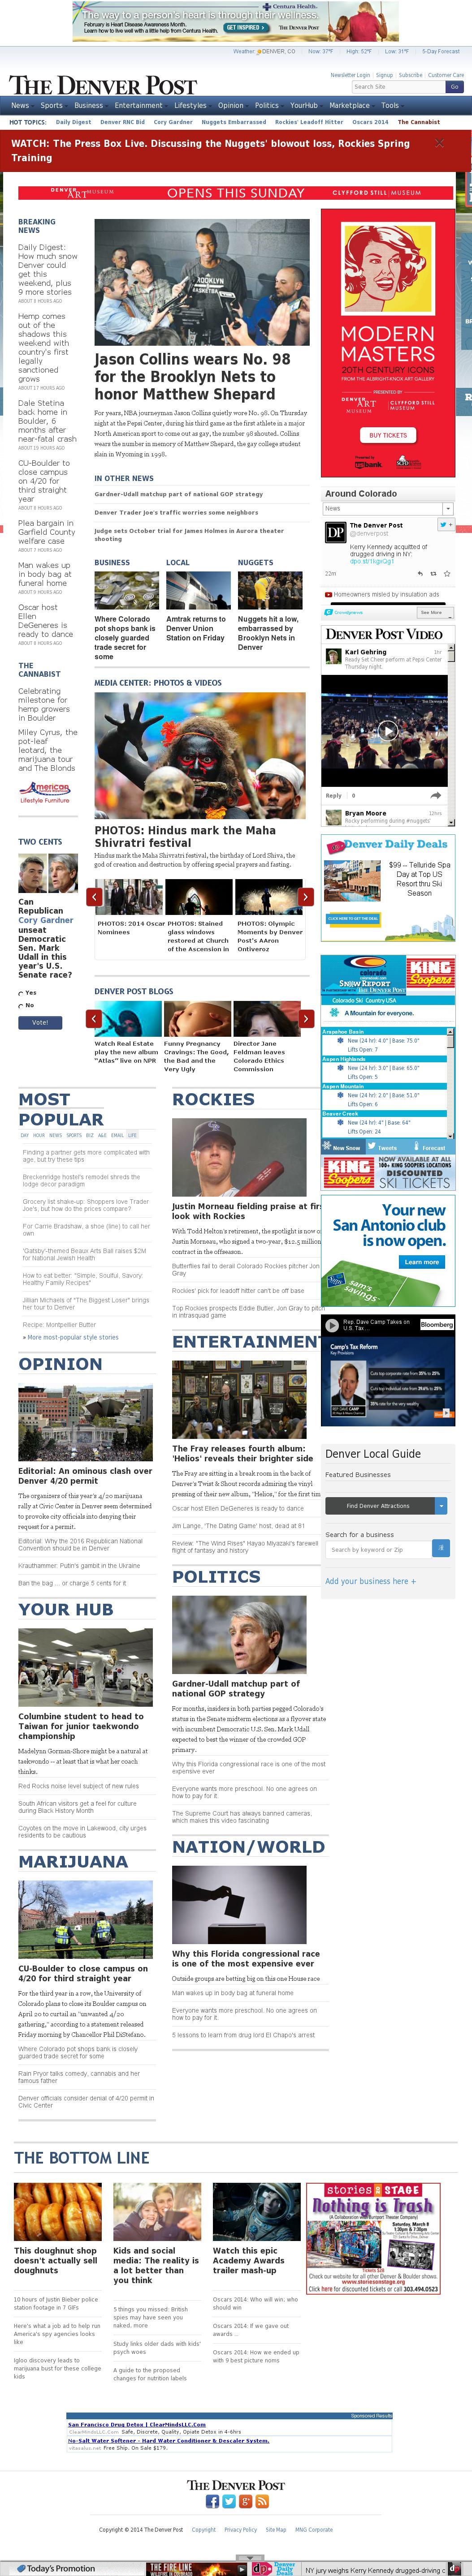 Denver Post at Friday Feb. 28, 2014, 4:03 p.m. UTC